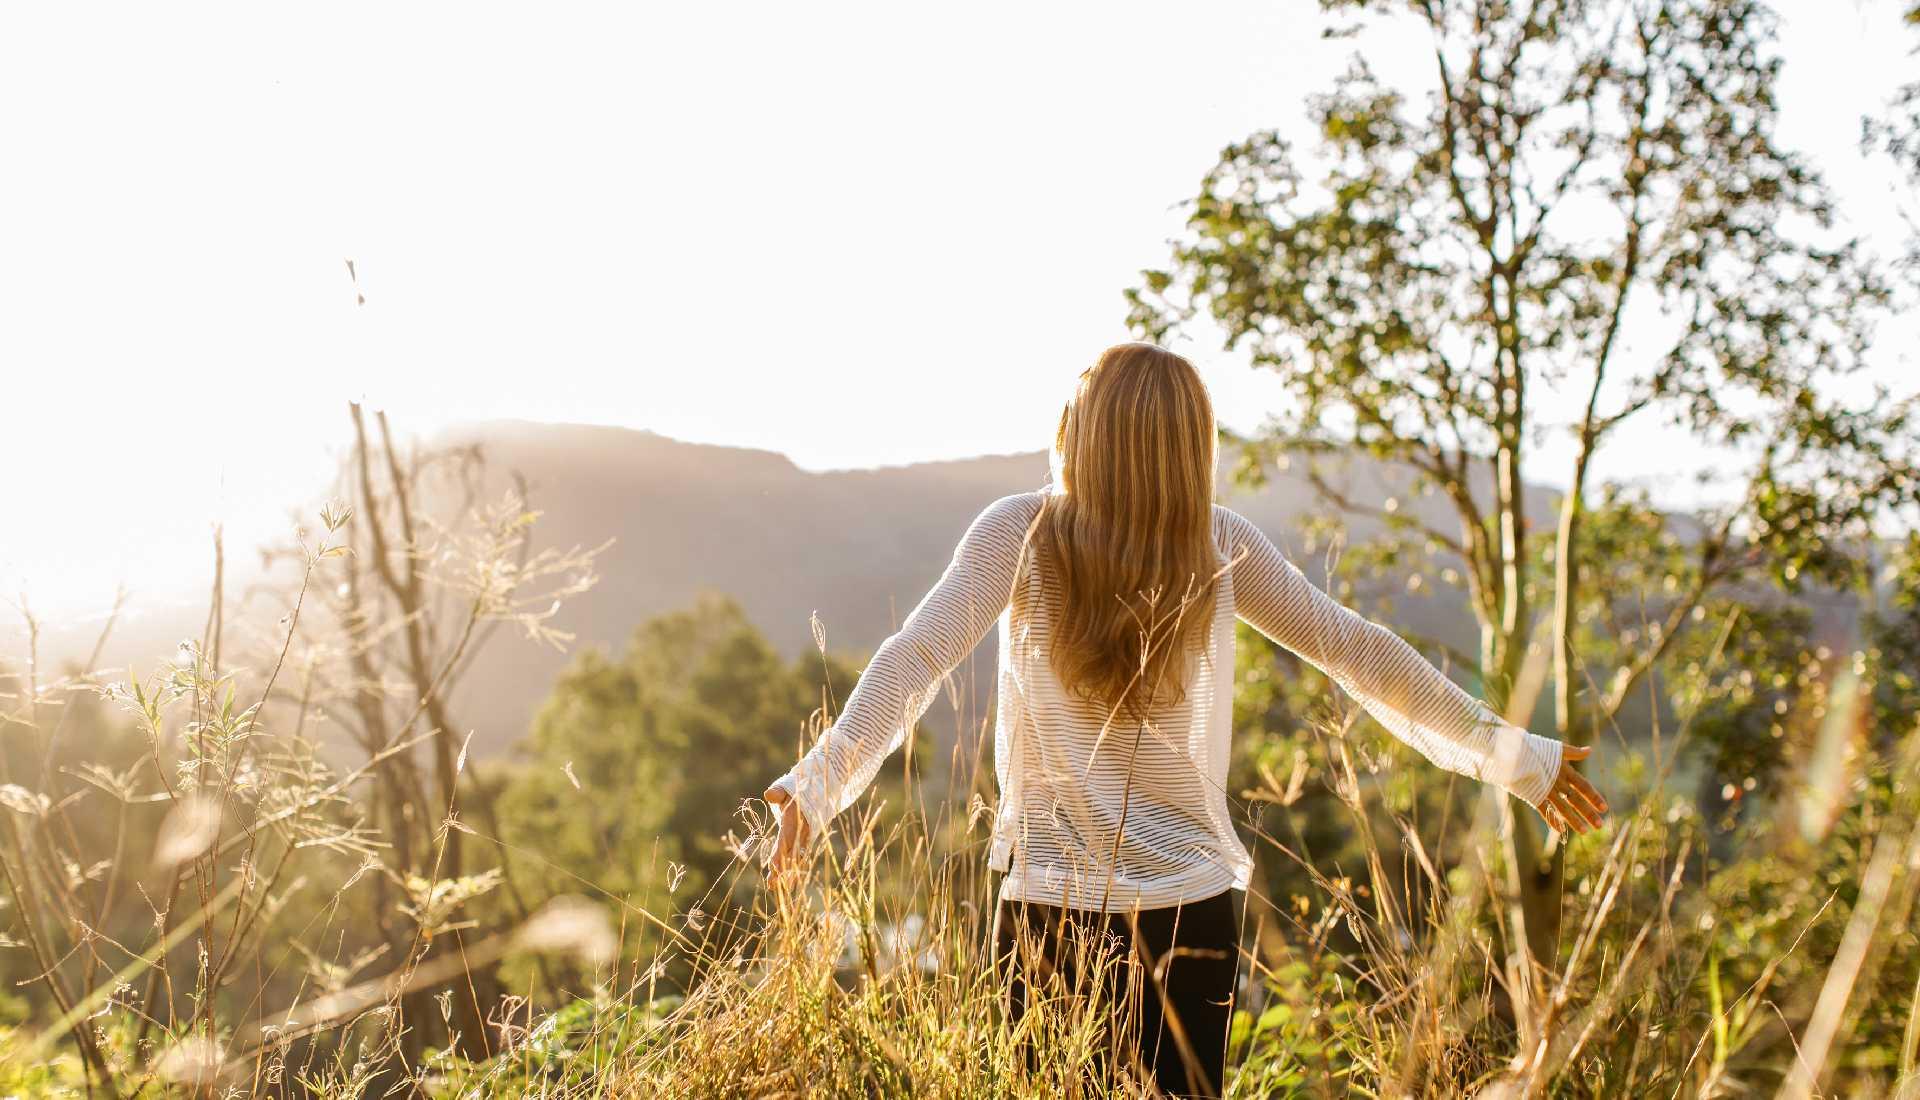 Elysia Retreat Top Tips to Improve Your Holistic Health